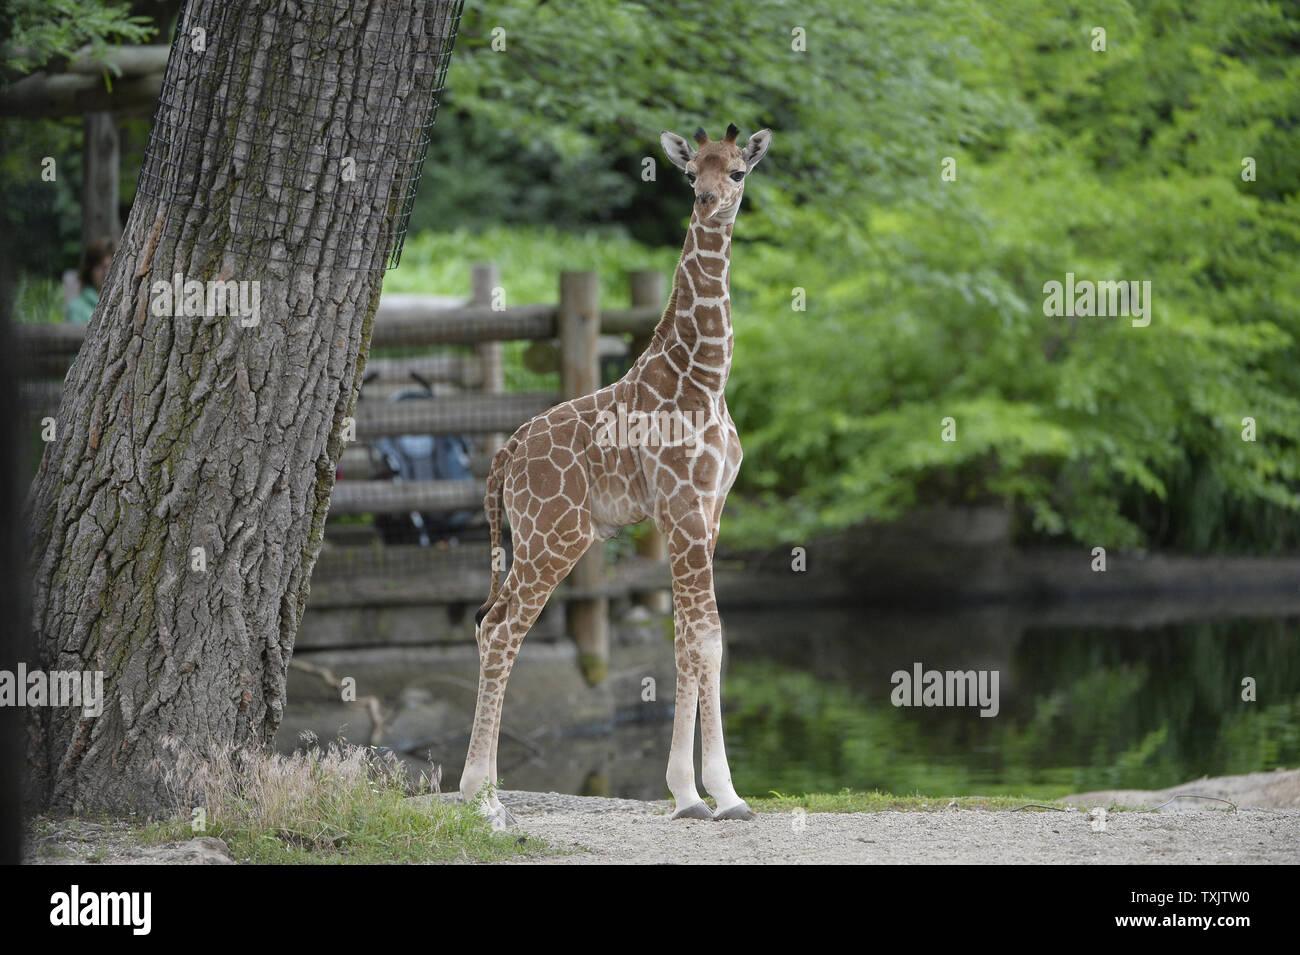 An 11 Day Old Giraffe Calf Explores His Habitat At The Brookfield